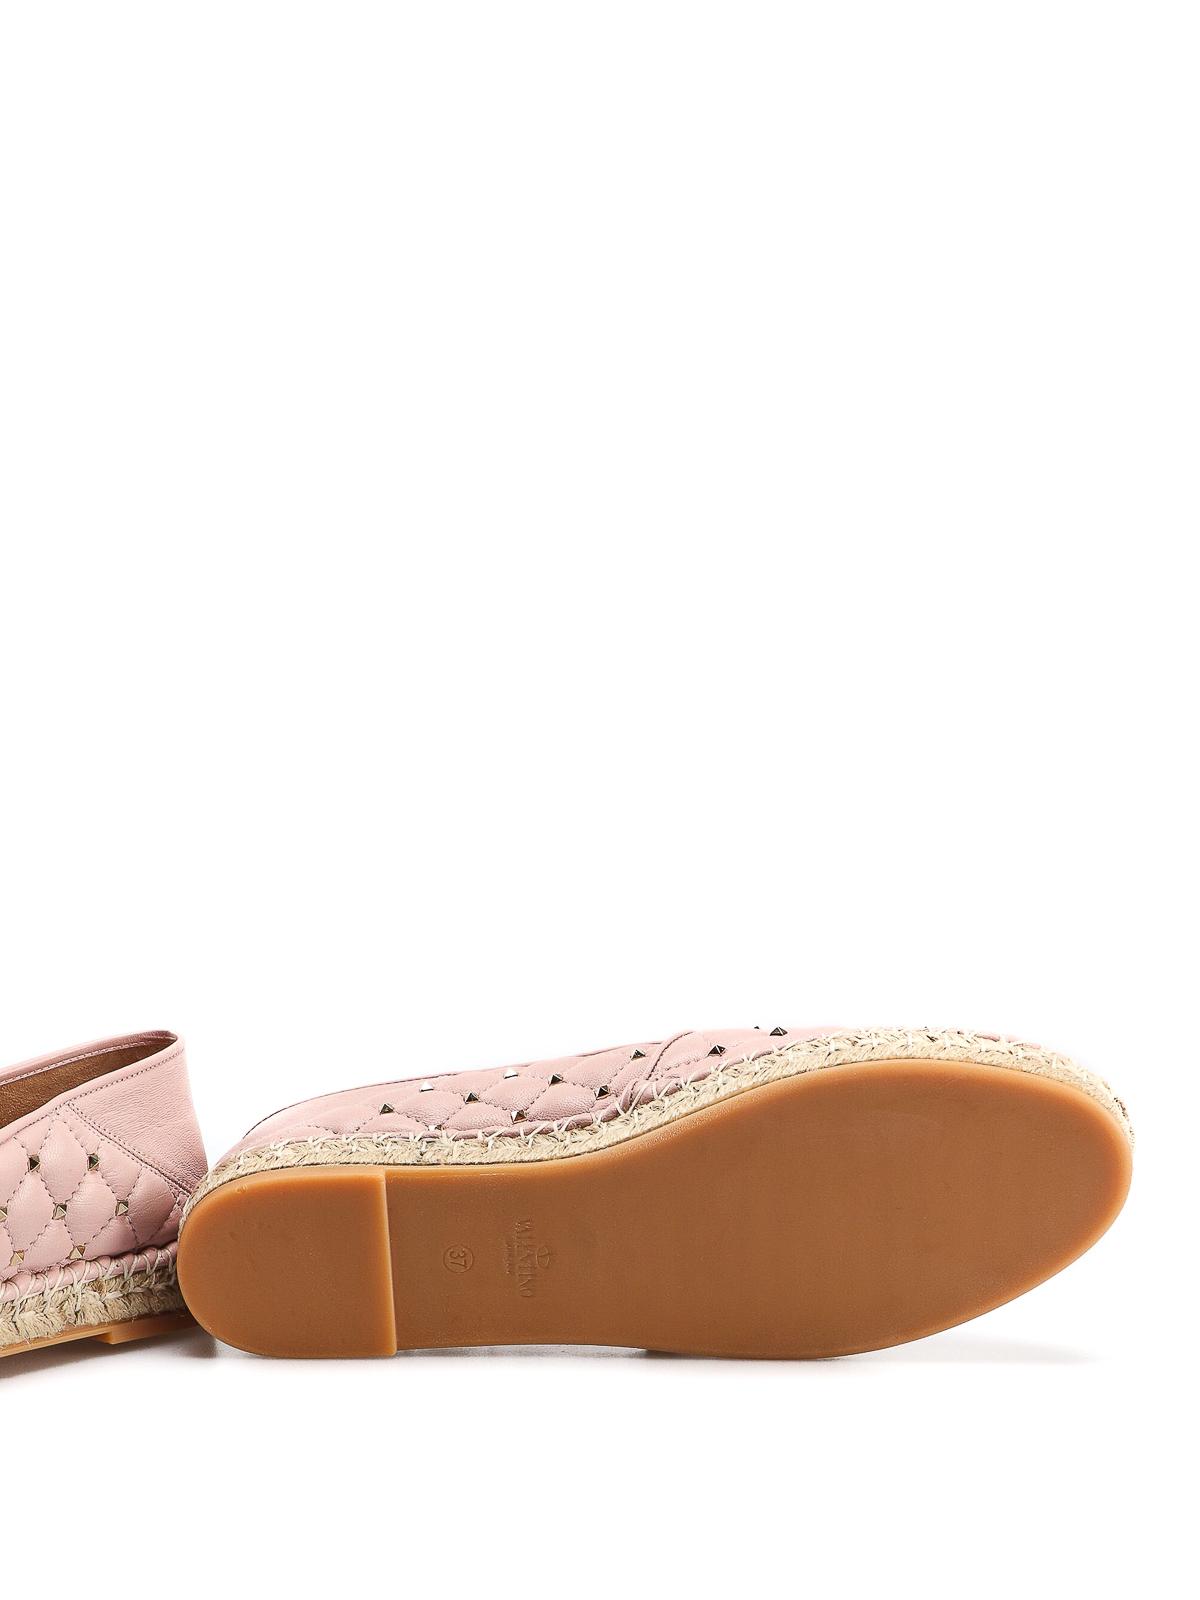 8aa6274d8 VALENTINO GARAVANI buy online Rockstud light pink leather espadrilles